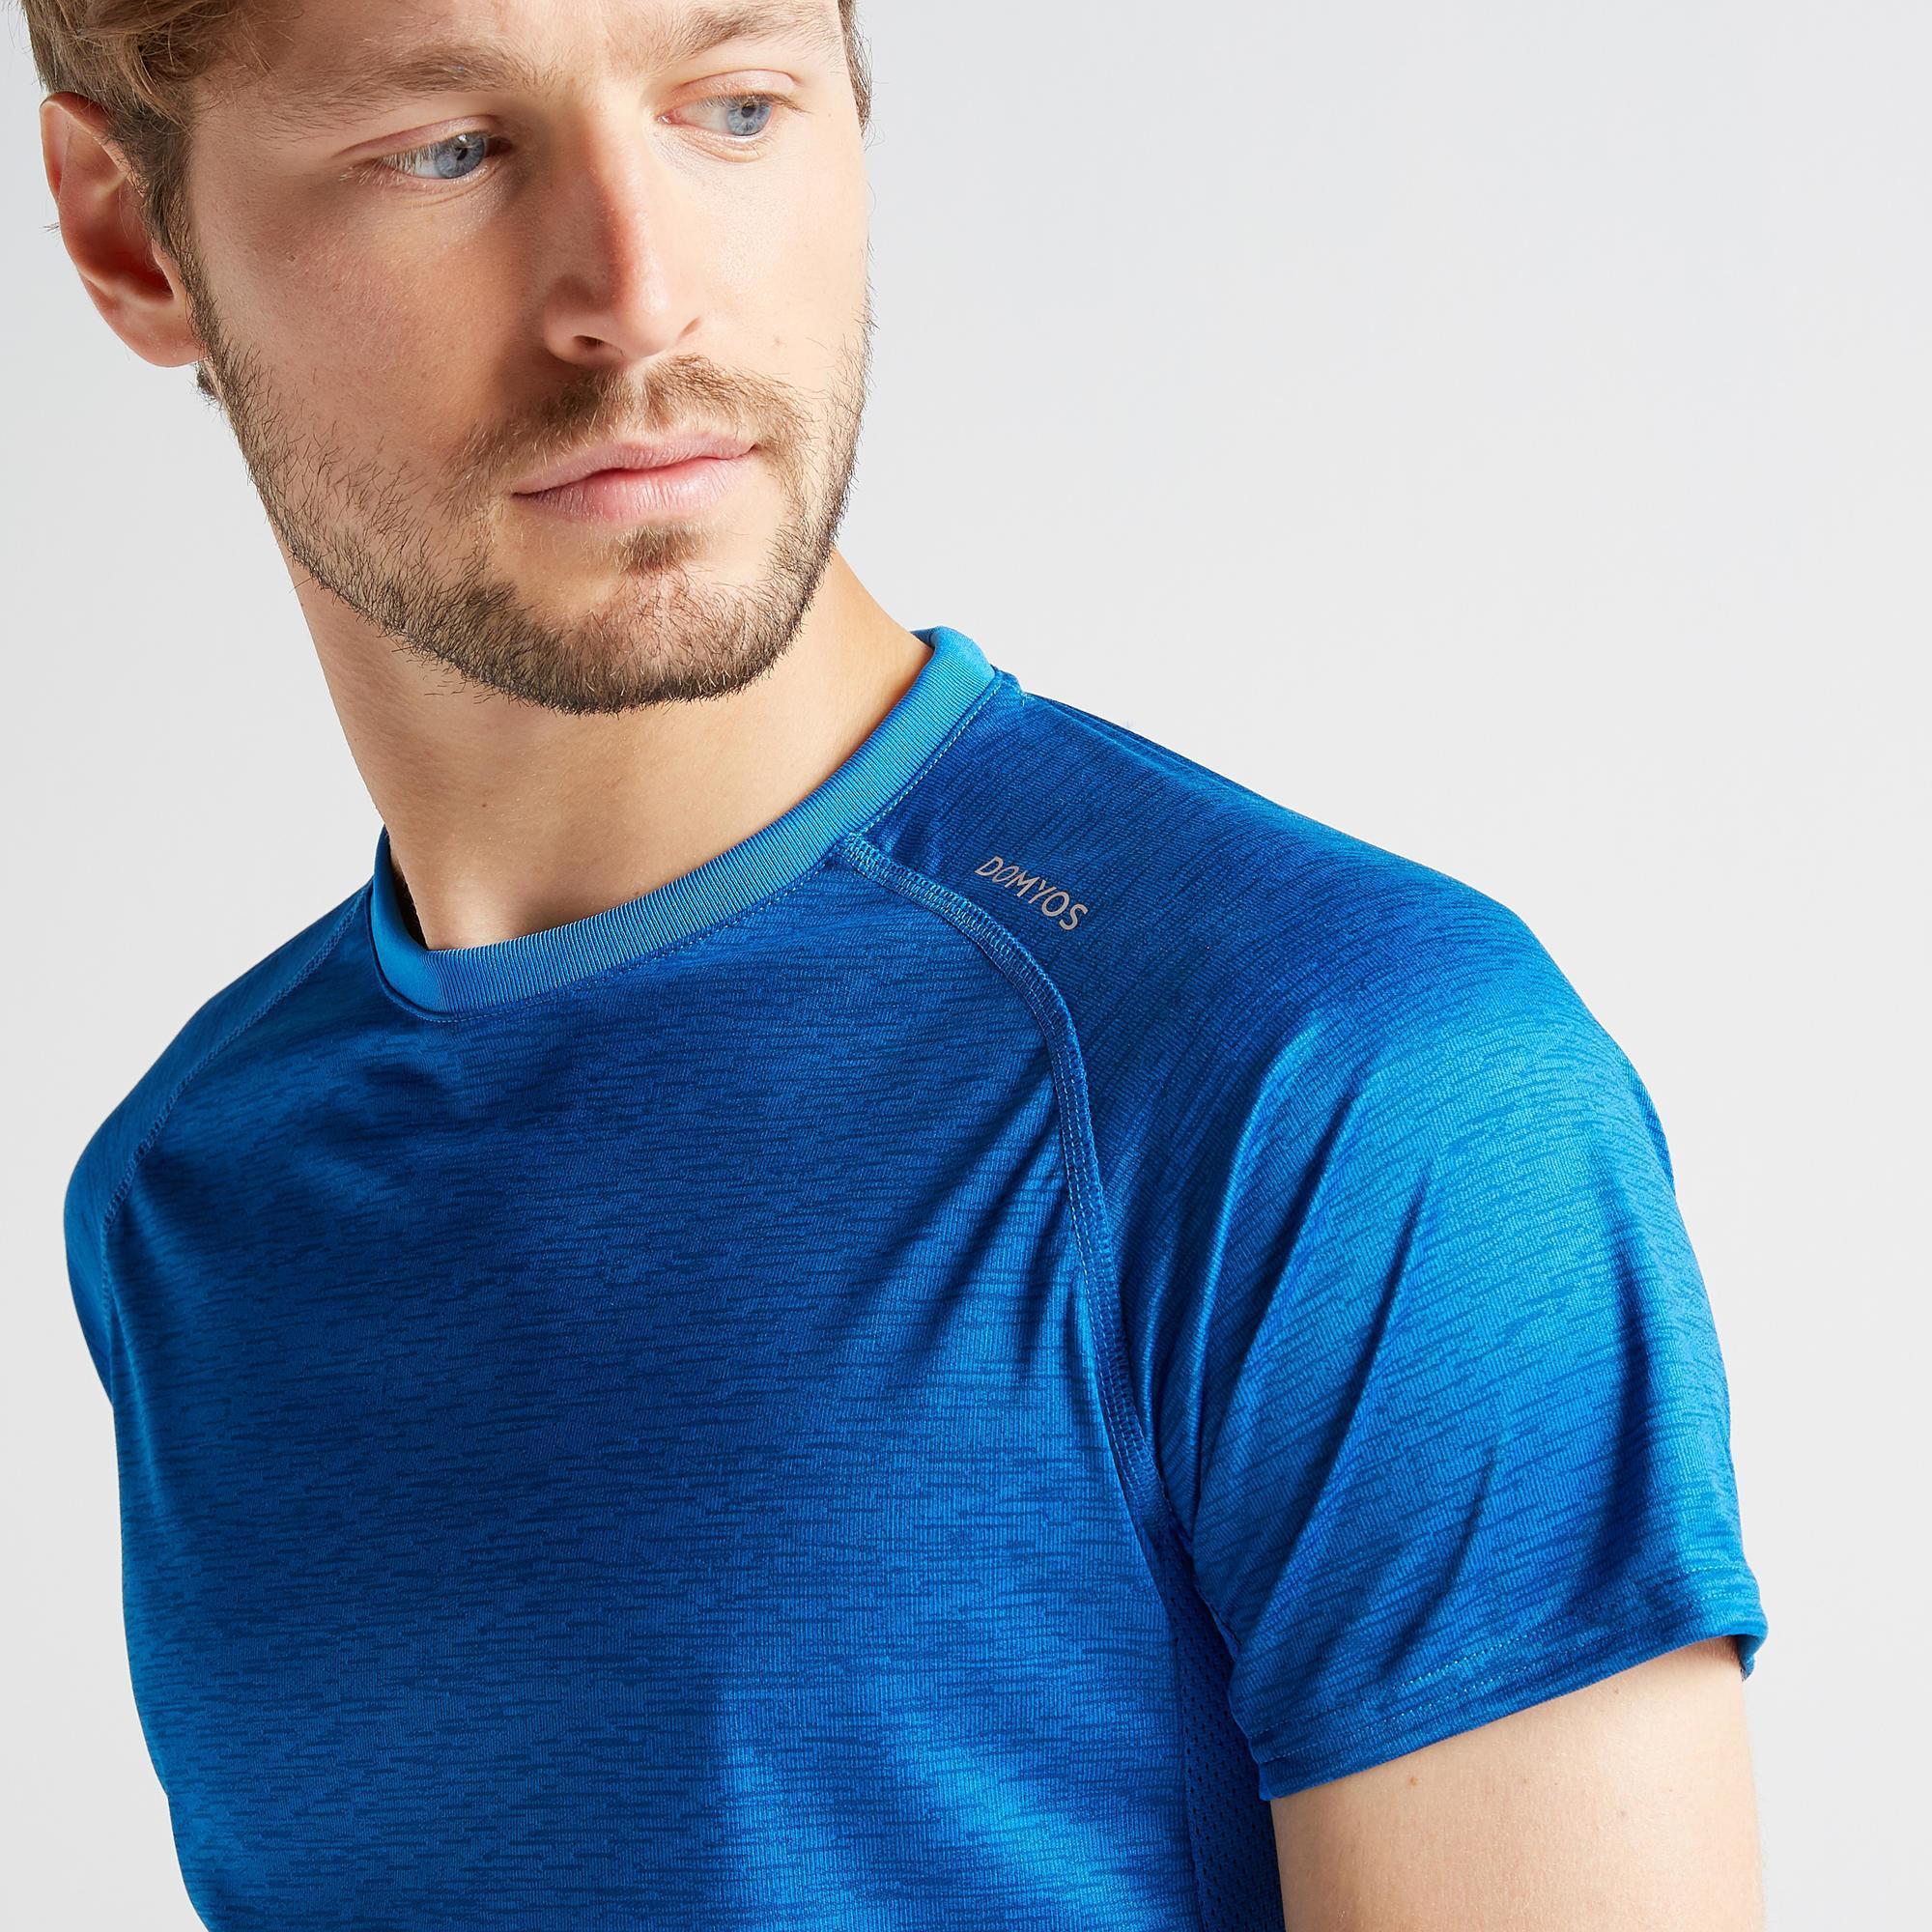 T-Shirt FTS 120 Fitness-/Cardiotraining Herren khaki/uni   Sportbekleidung > Sportshirts > Poloshirts   Domyos